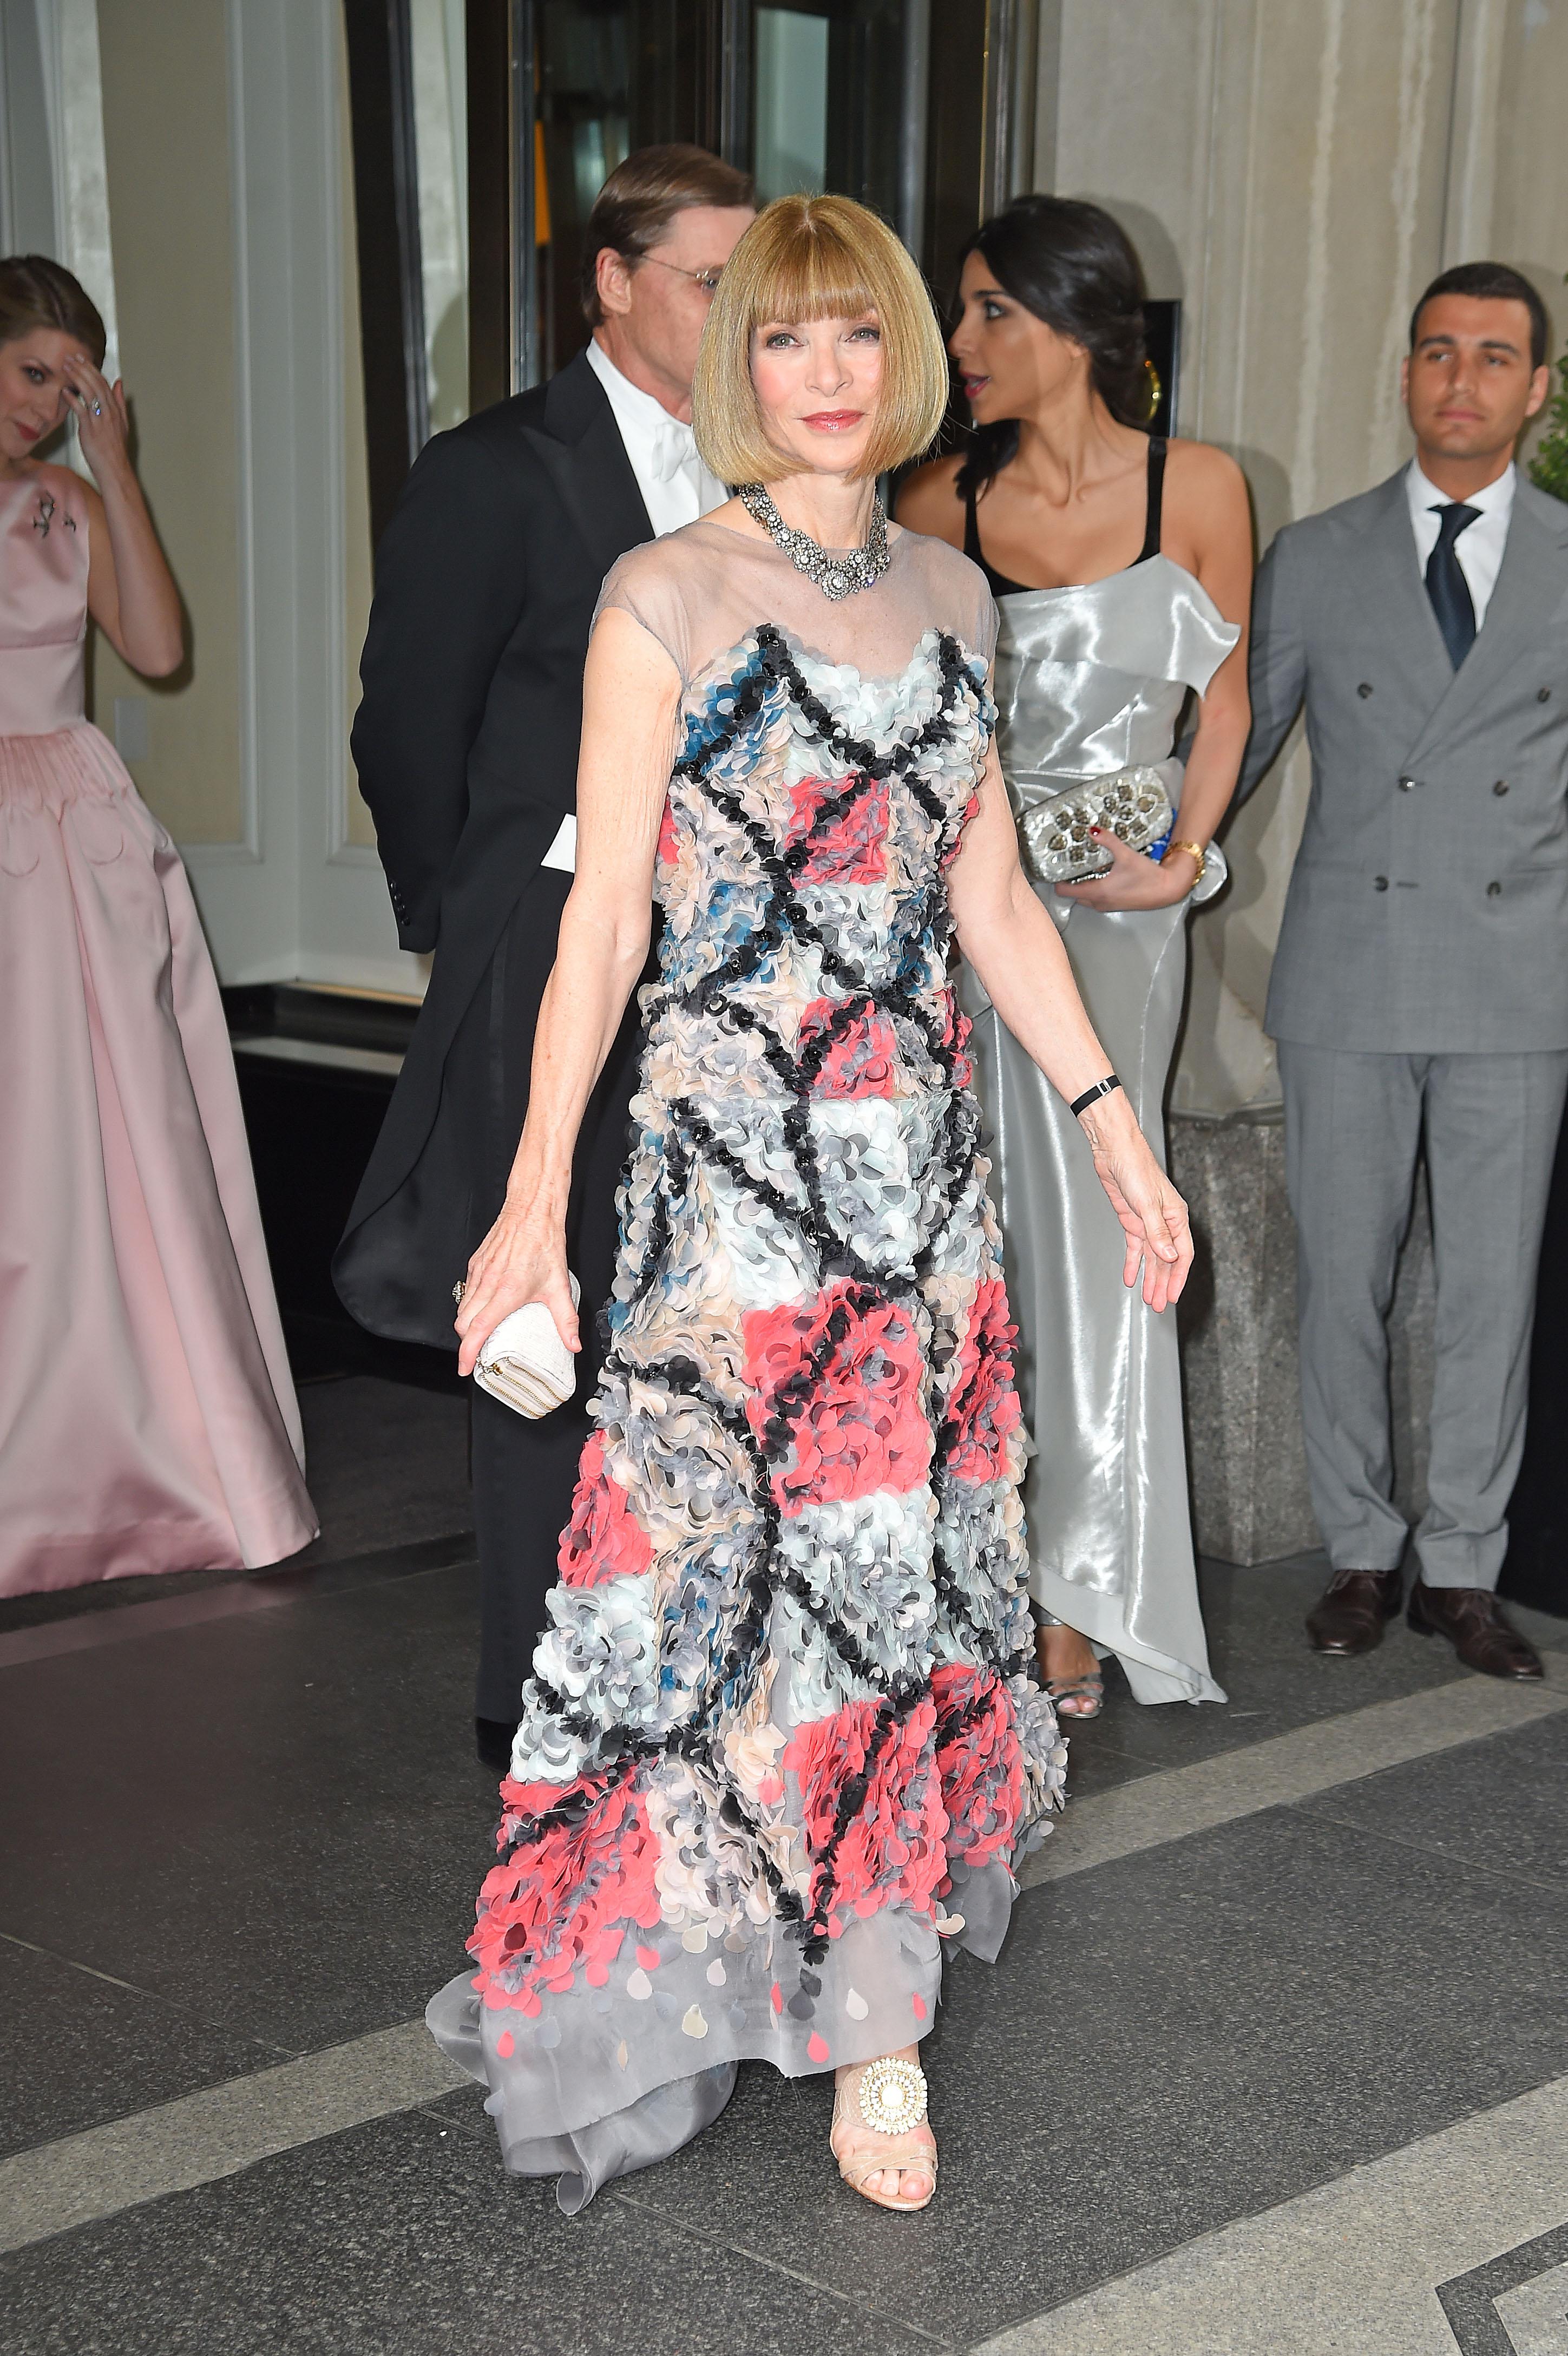 Anna Wintour Met Gala 2014